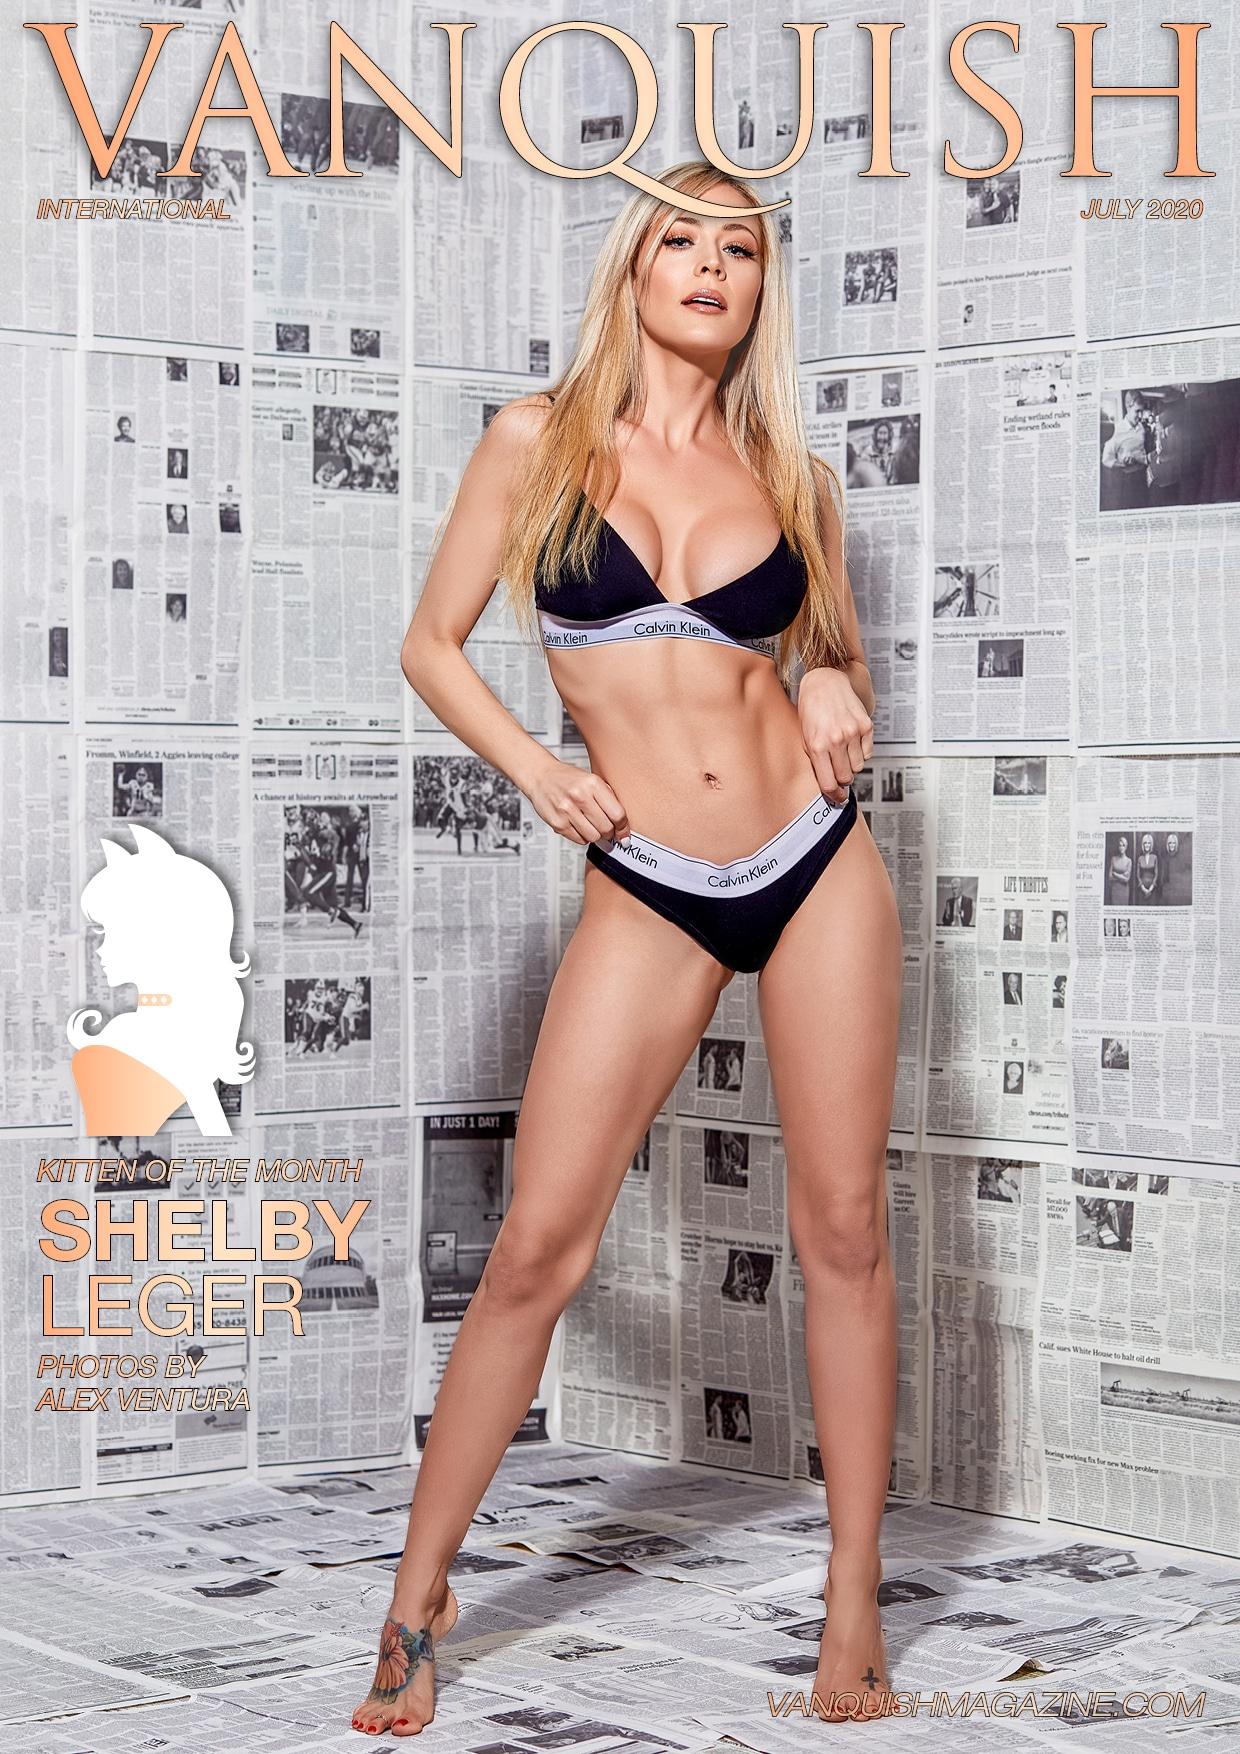 Vanquish Magazine - July 2020 - Shelby Leger